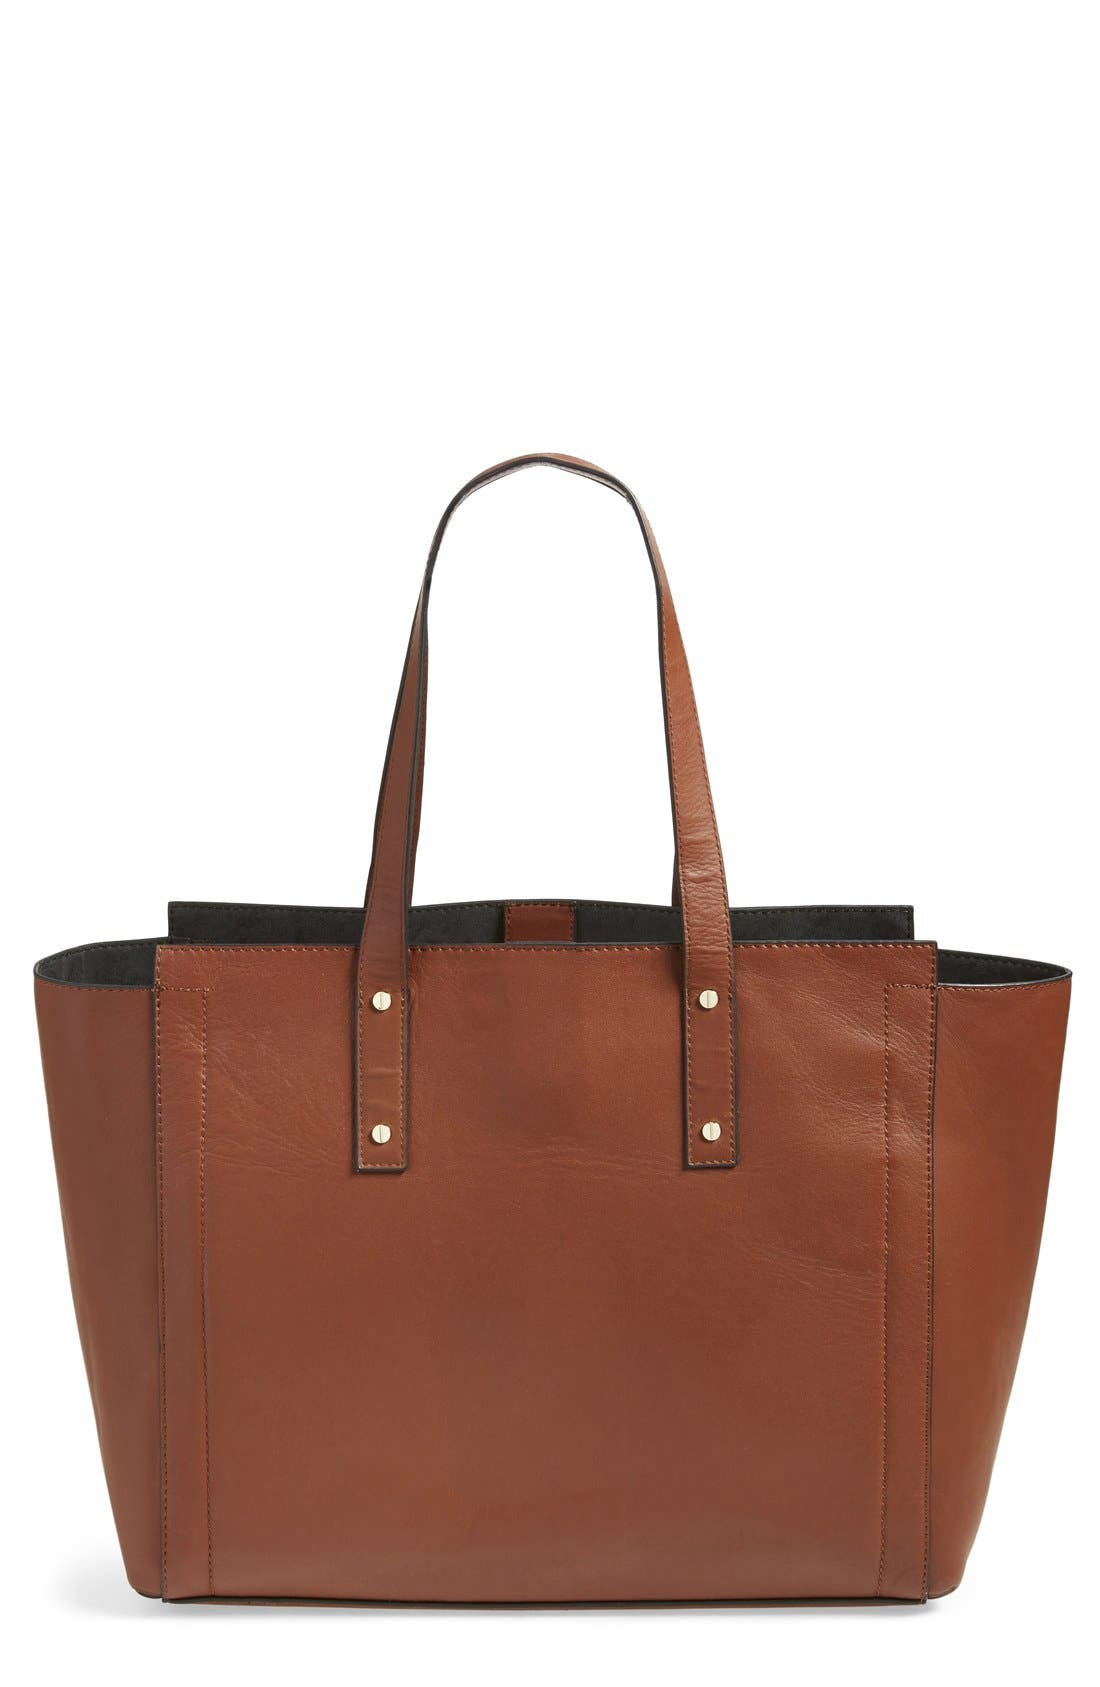 'Soho' Leather Tote,                             Main thumbnail 1, color,                             Luggage